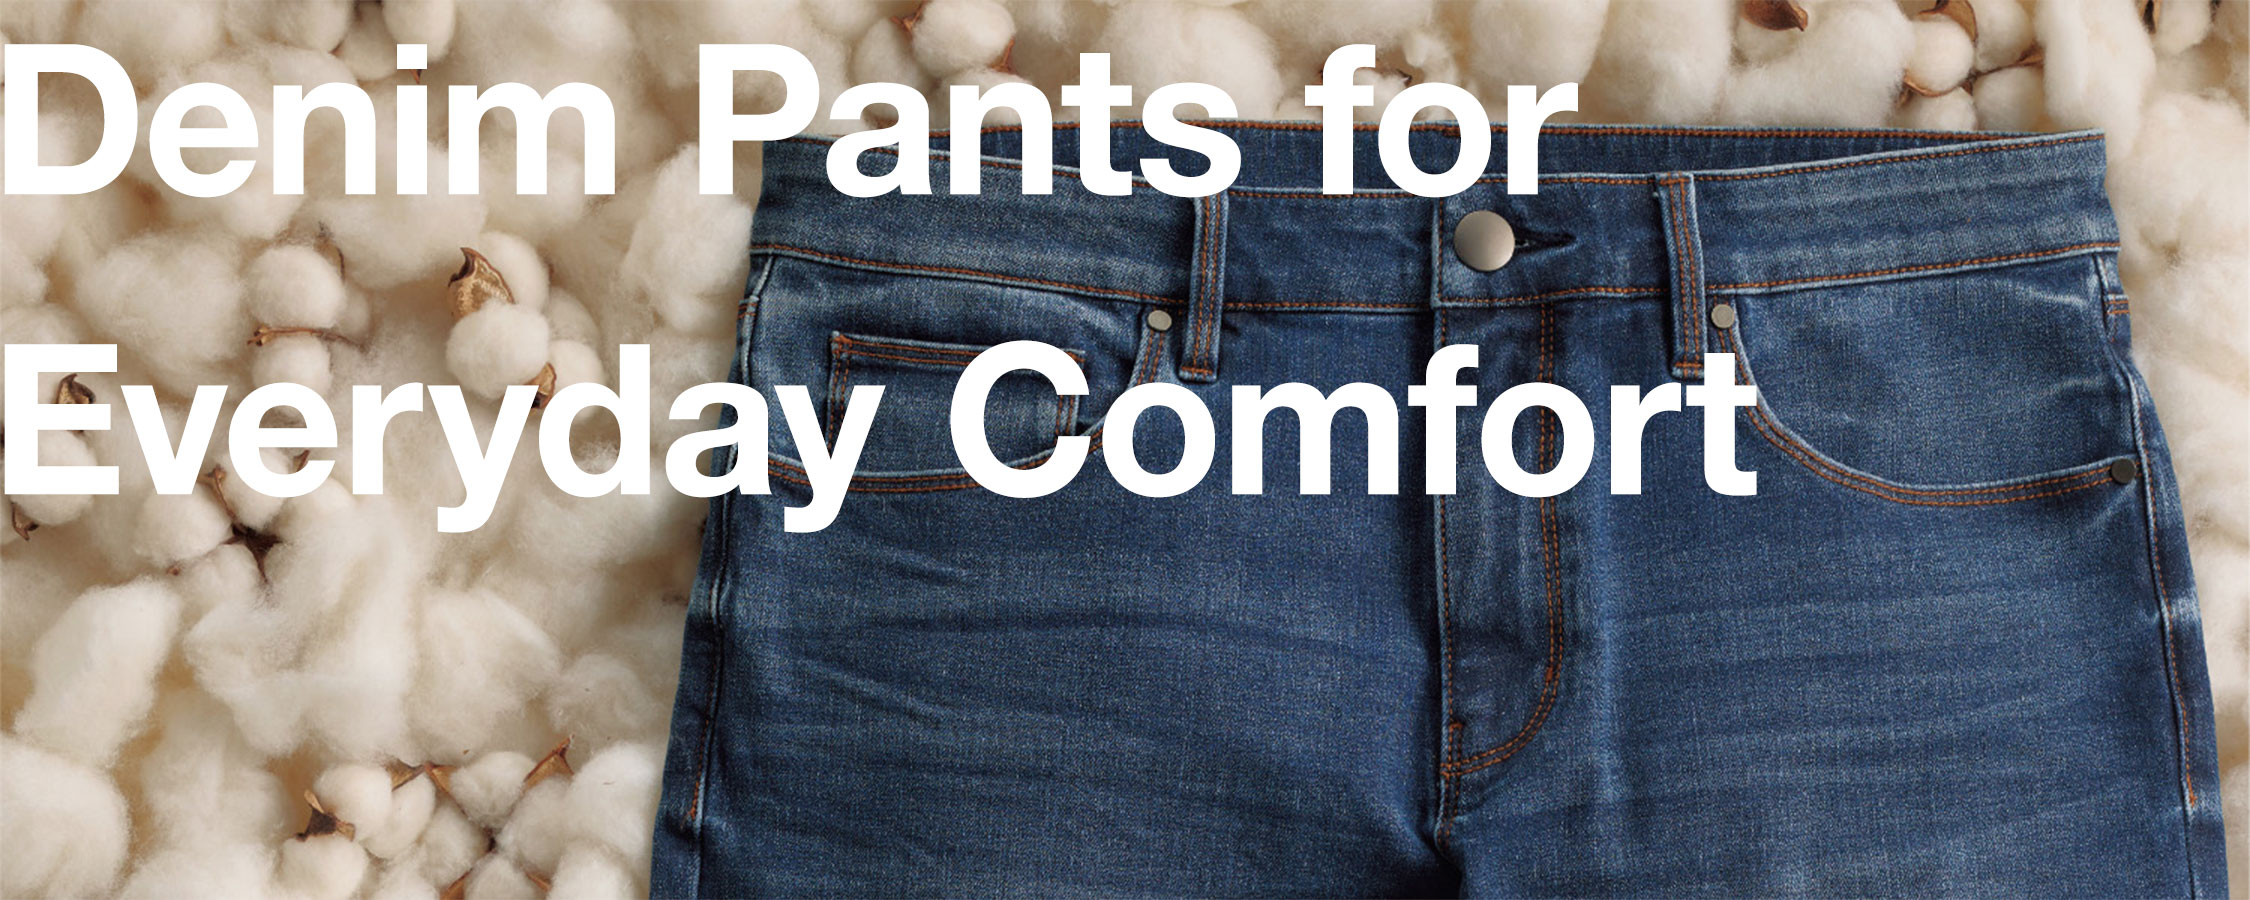 Denim Pants for Everyday Comfort